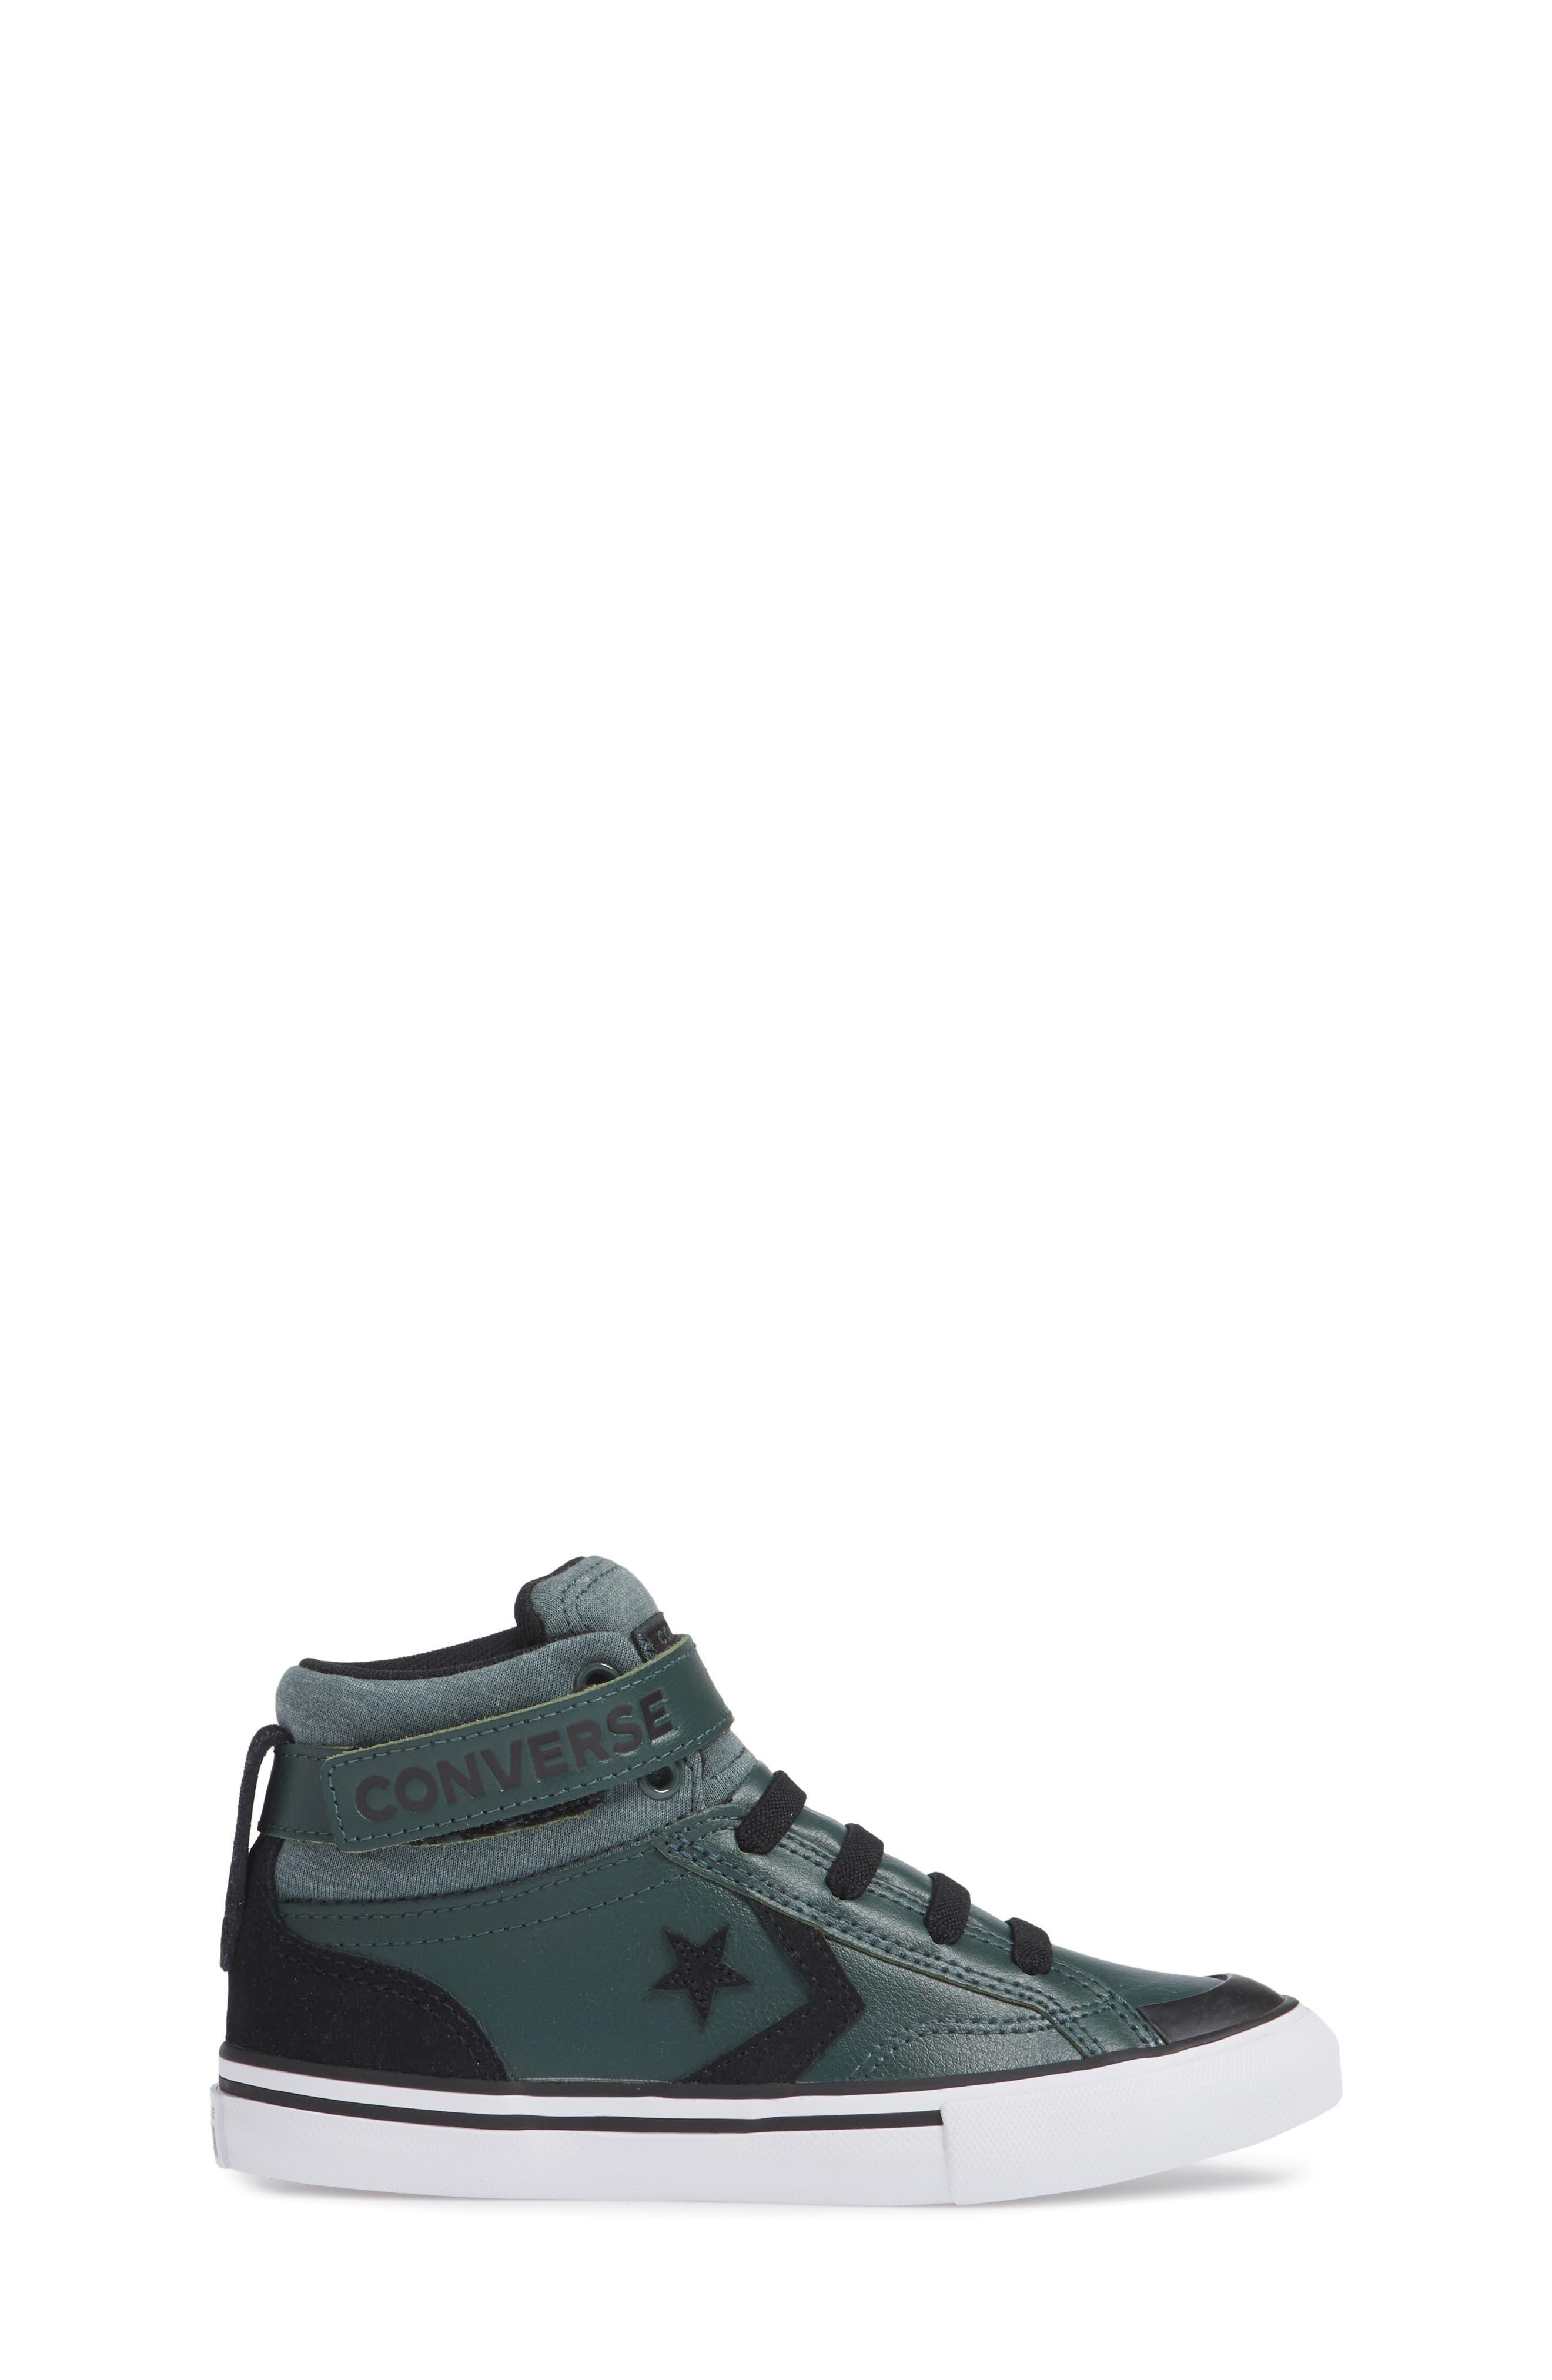 Pro Blaze High Top Sneaker,                             Alternate thumbnail 3, color,                             VINTAGE GREEN